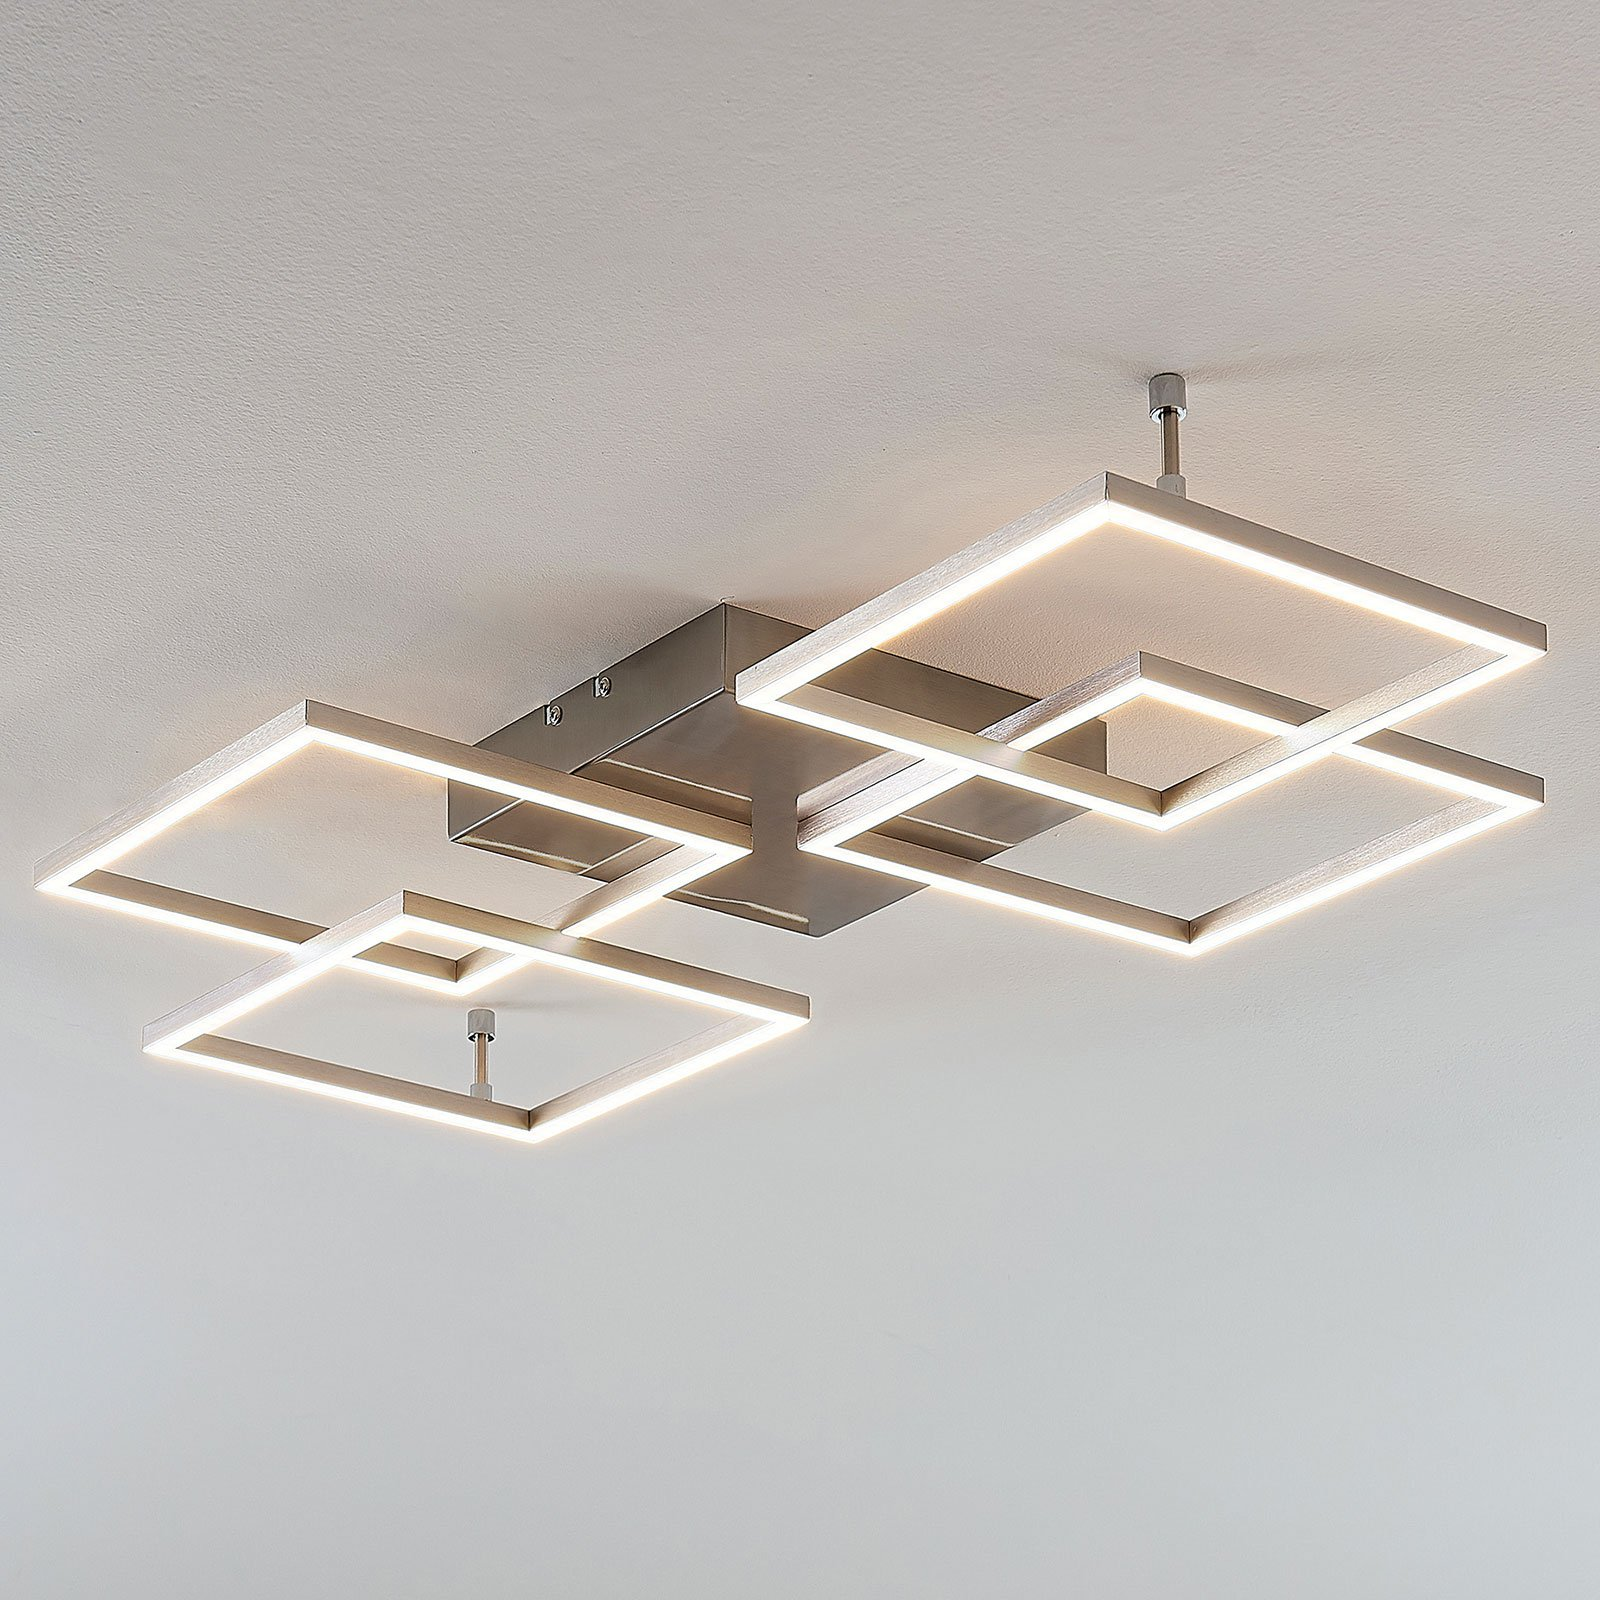 Dimbar LED-taklampe Quadra, 4 lyskilder